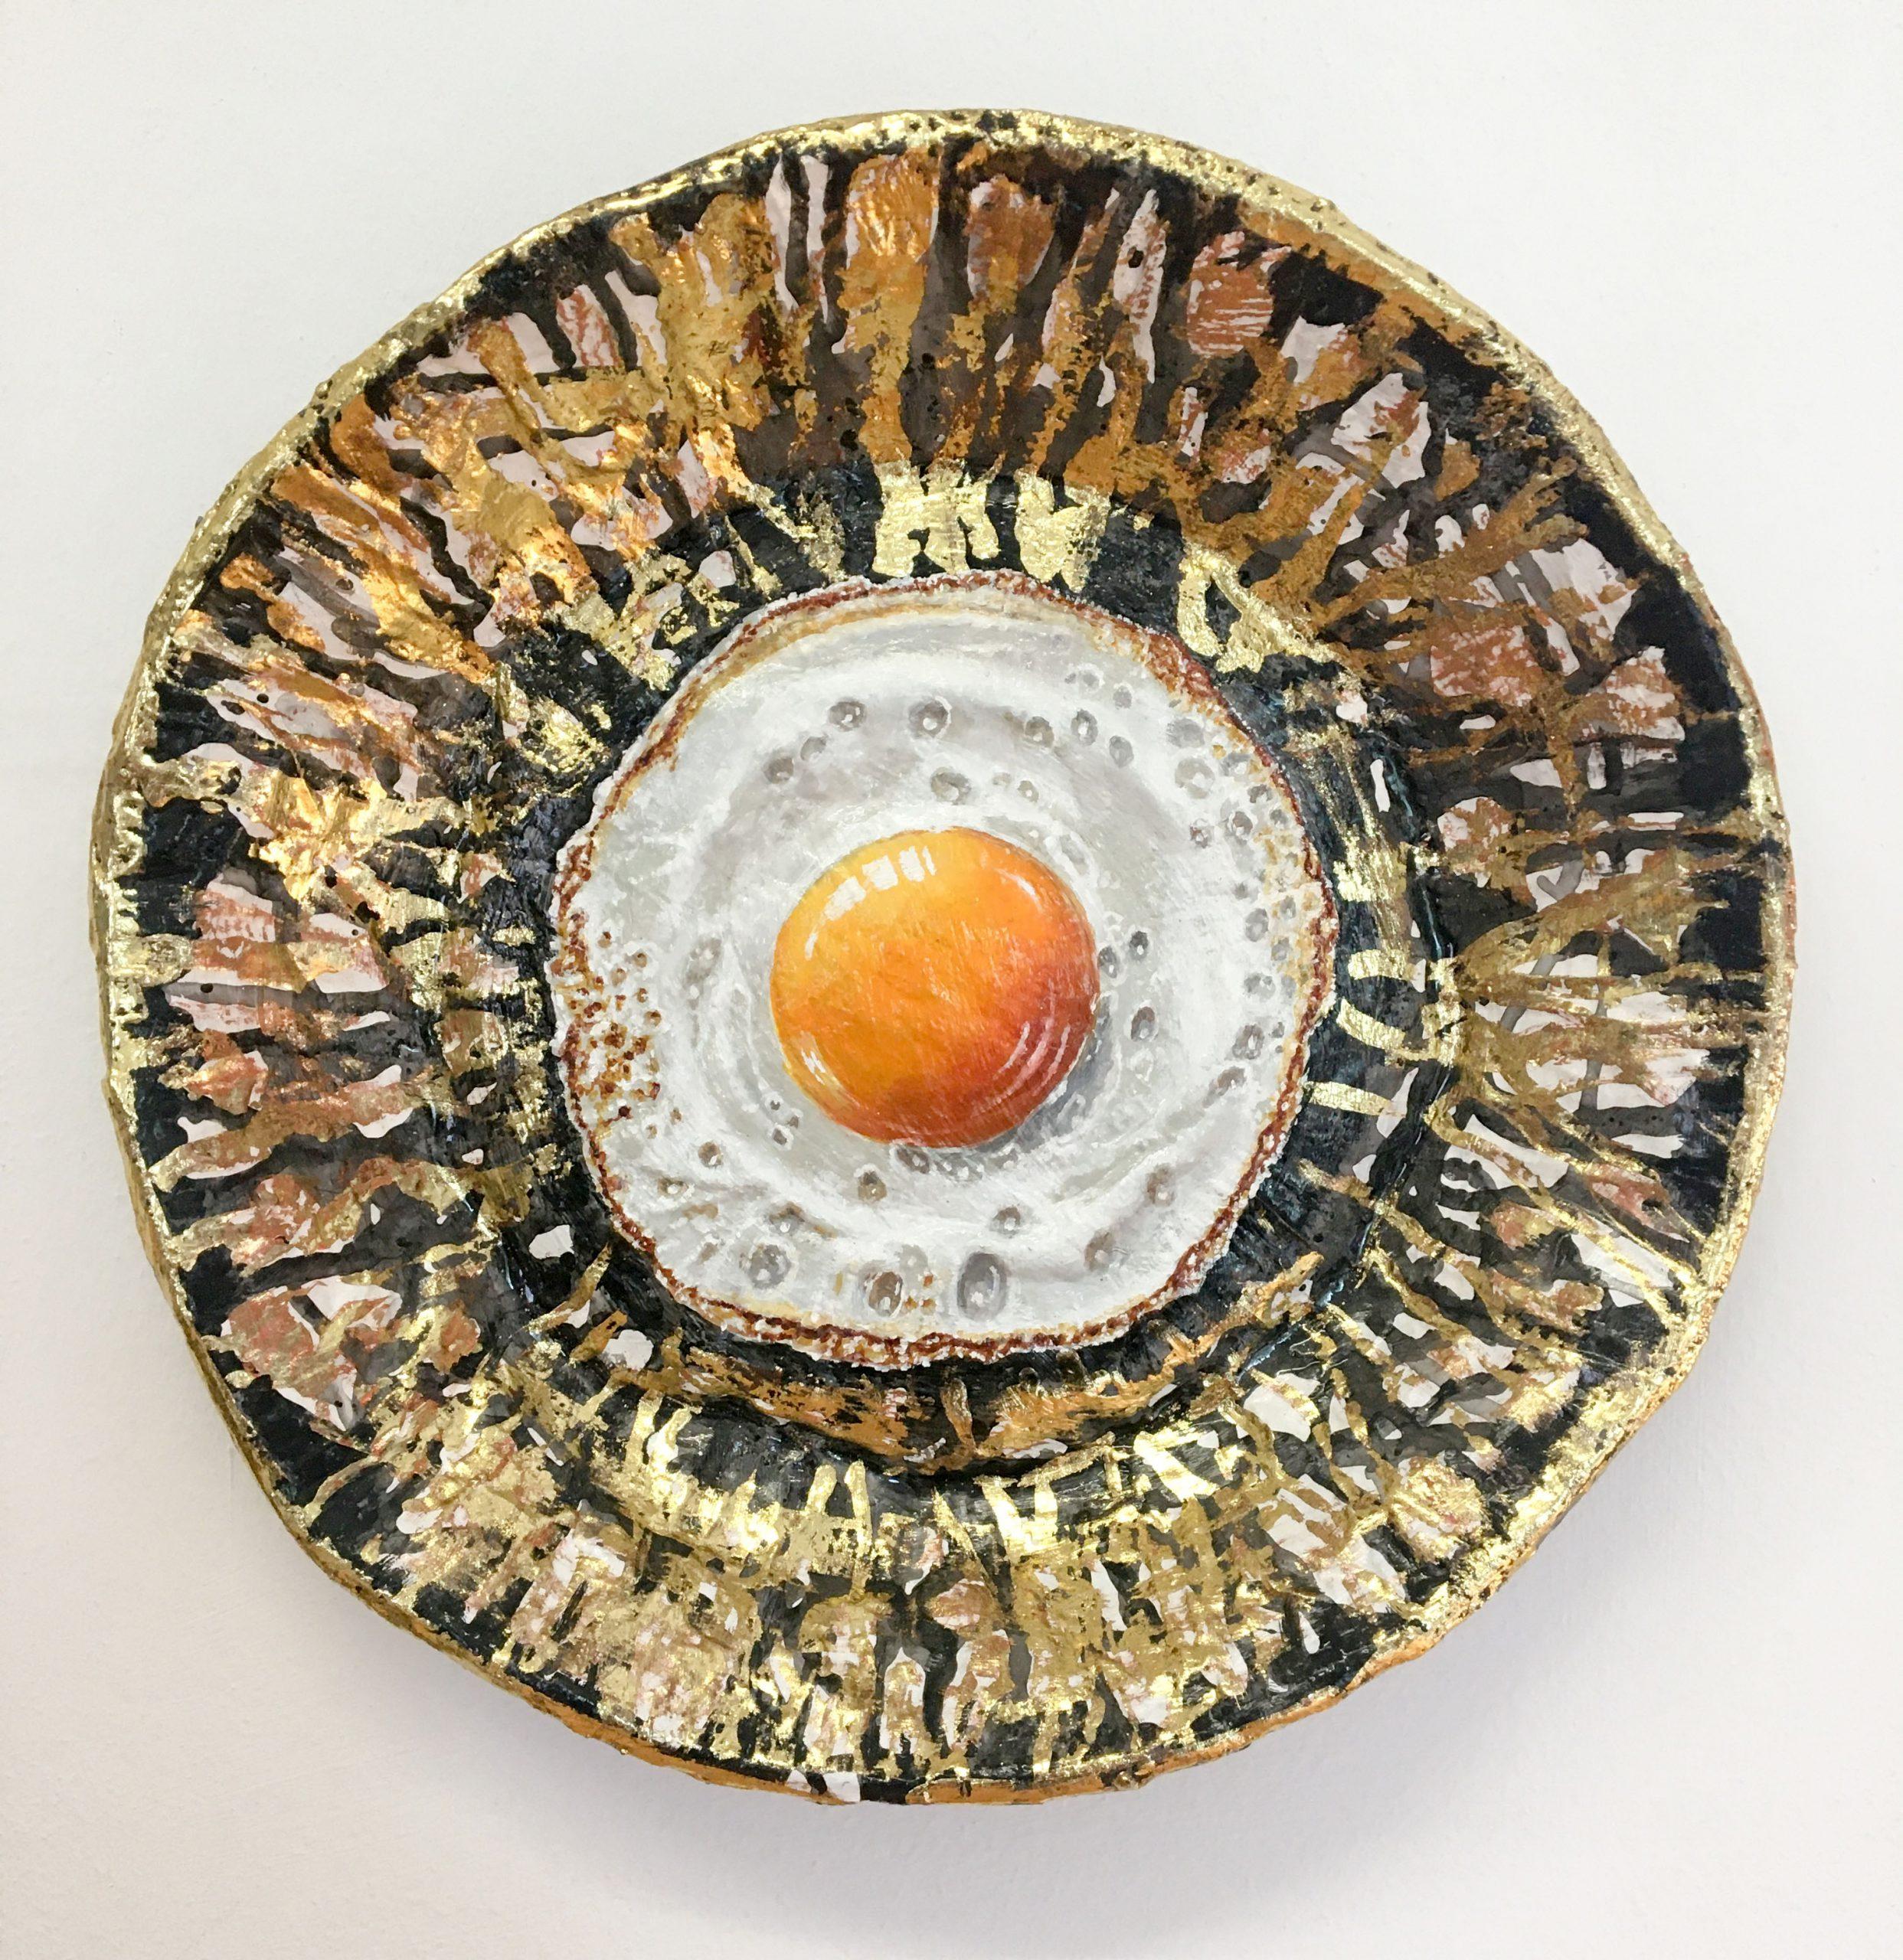 Kunst: Klein spiegelei 2 van kunstenaar Katinka Krijgsman